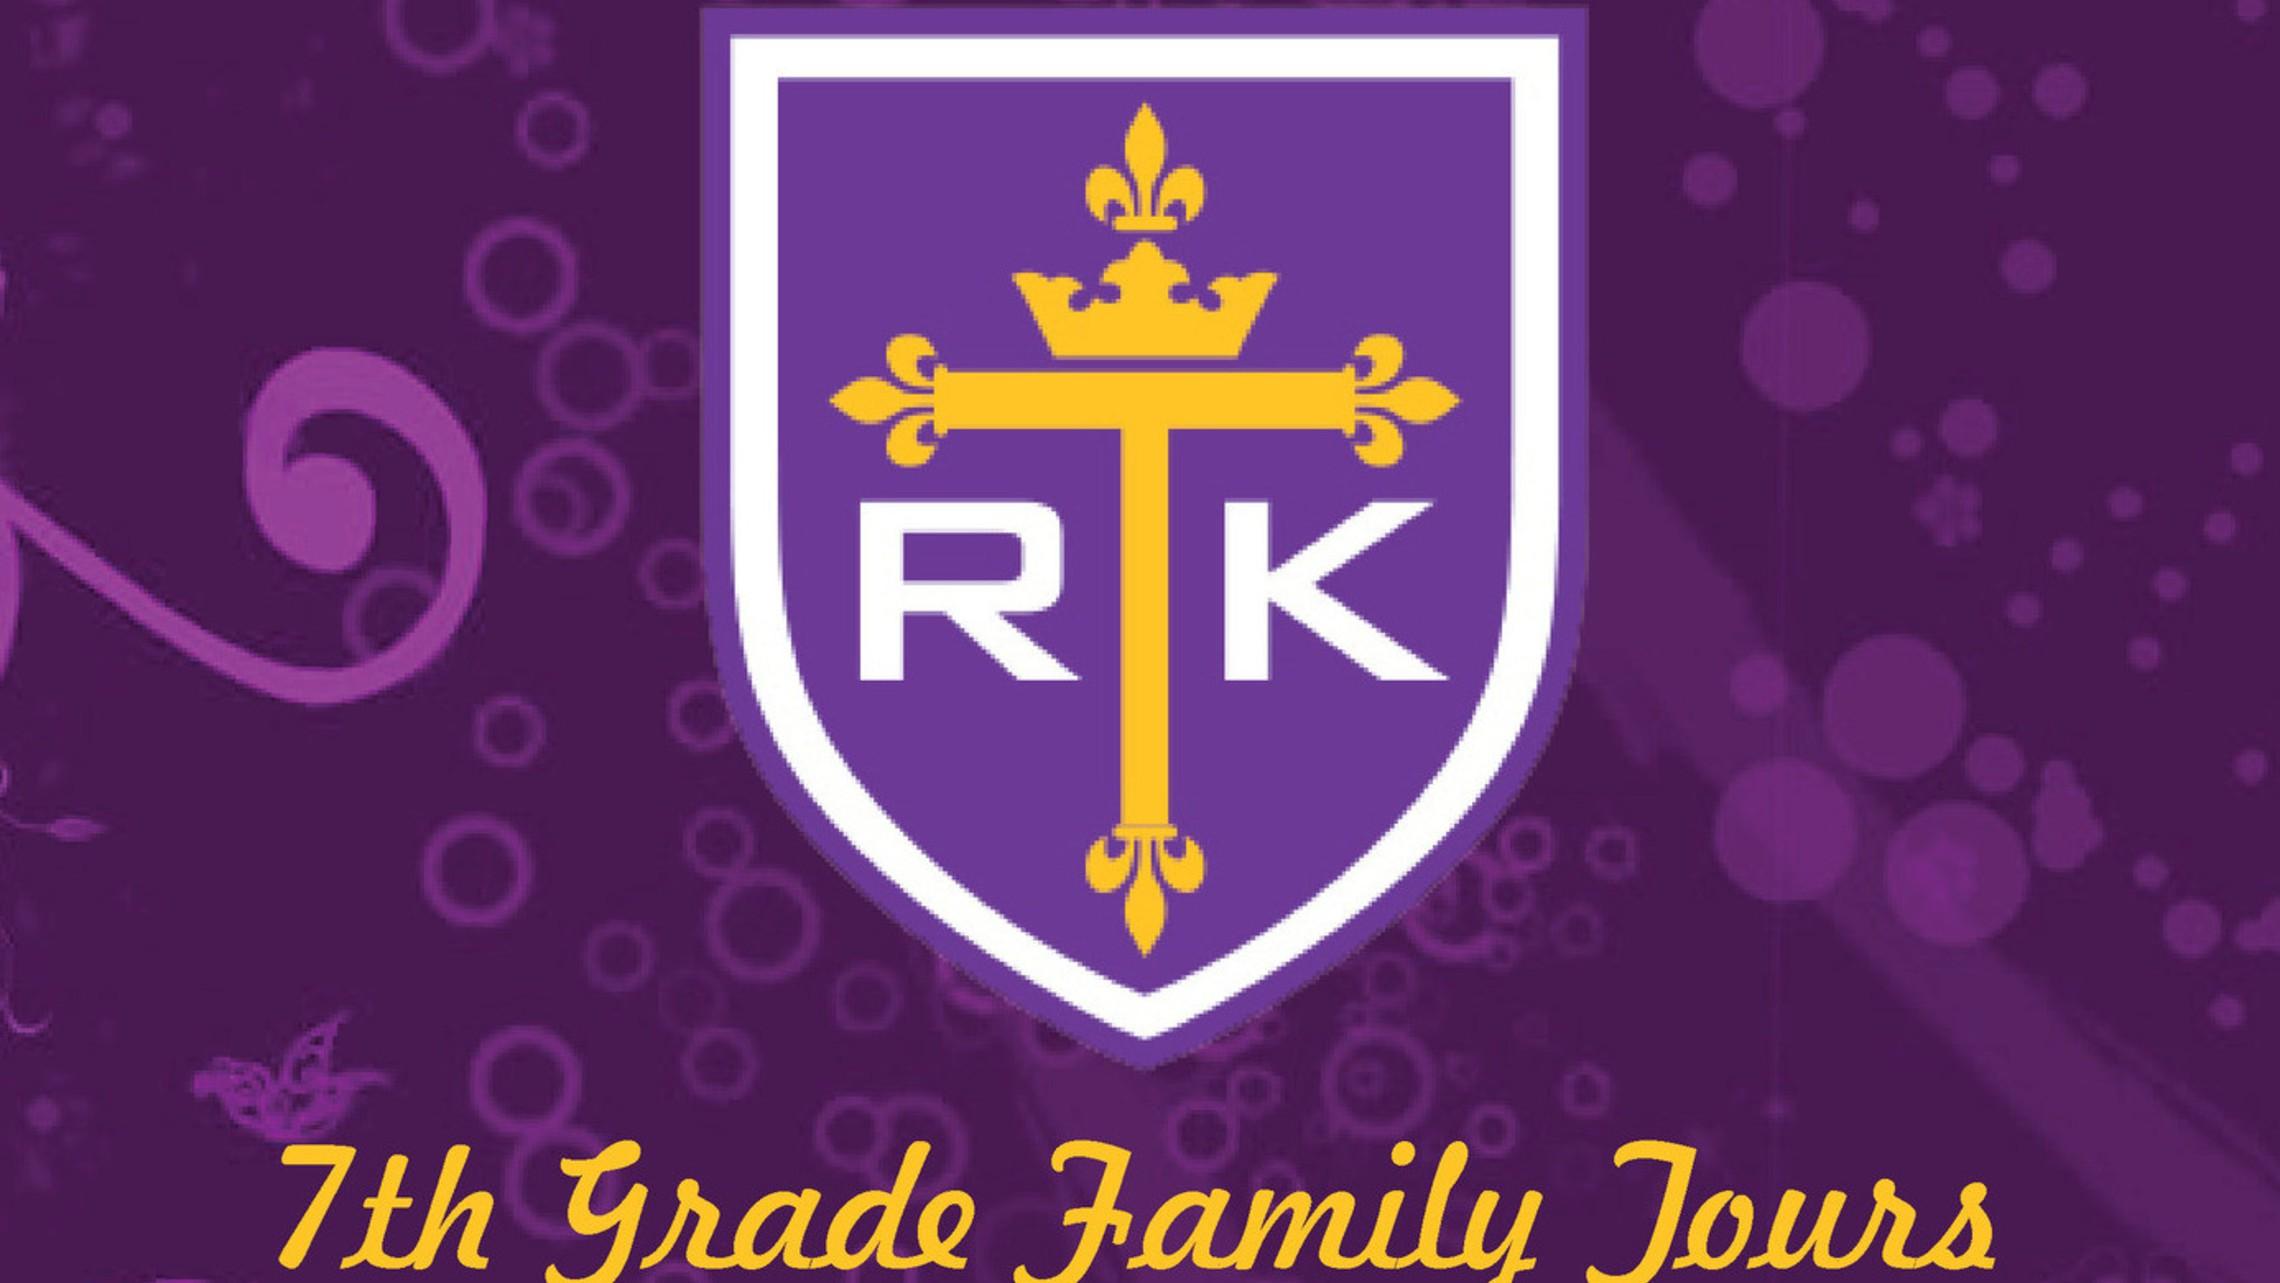 7th Grade Family Tours